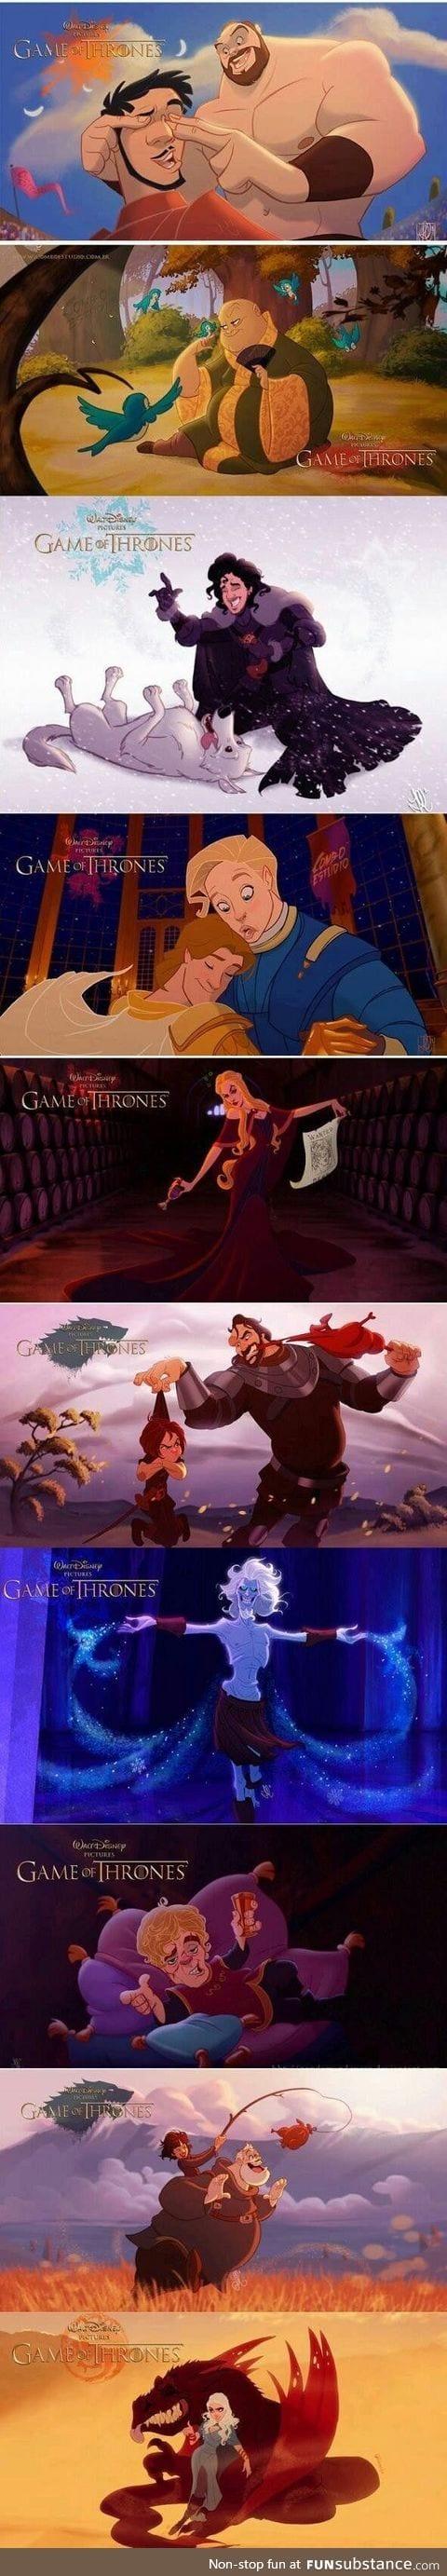 If Game Of Thrones went Disney